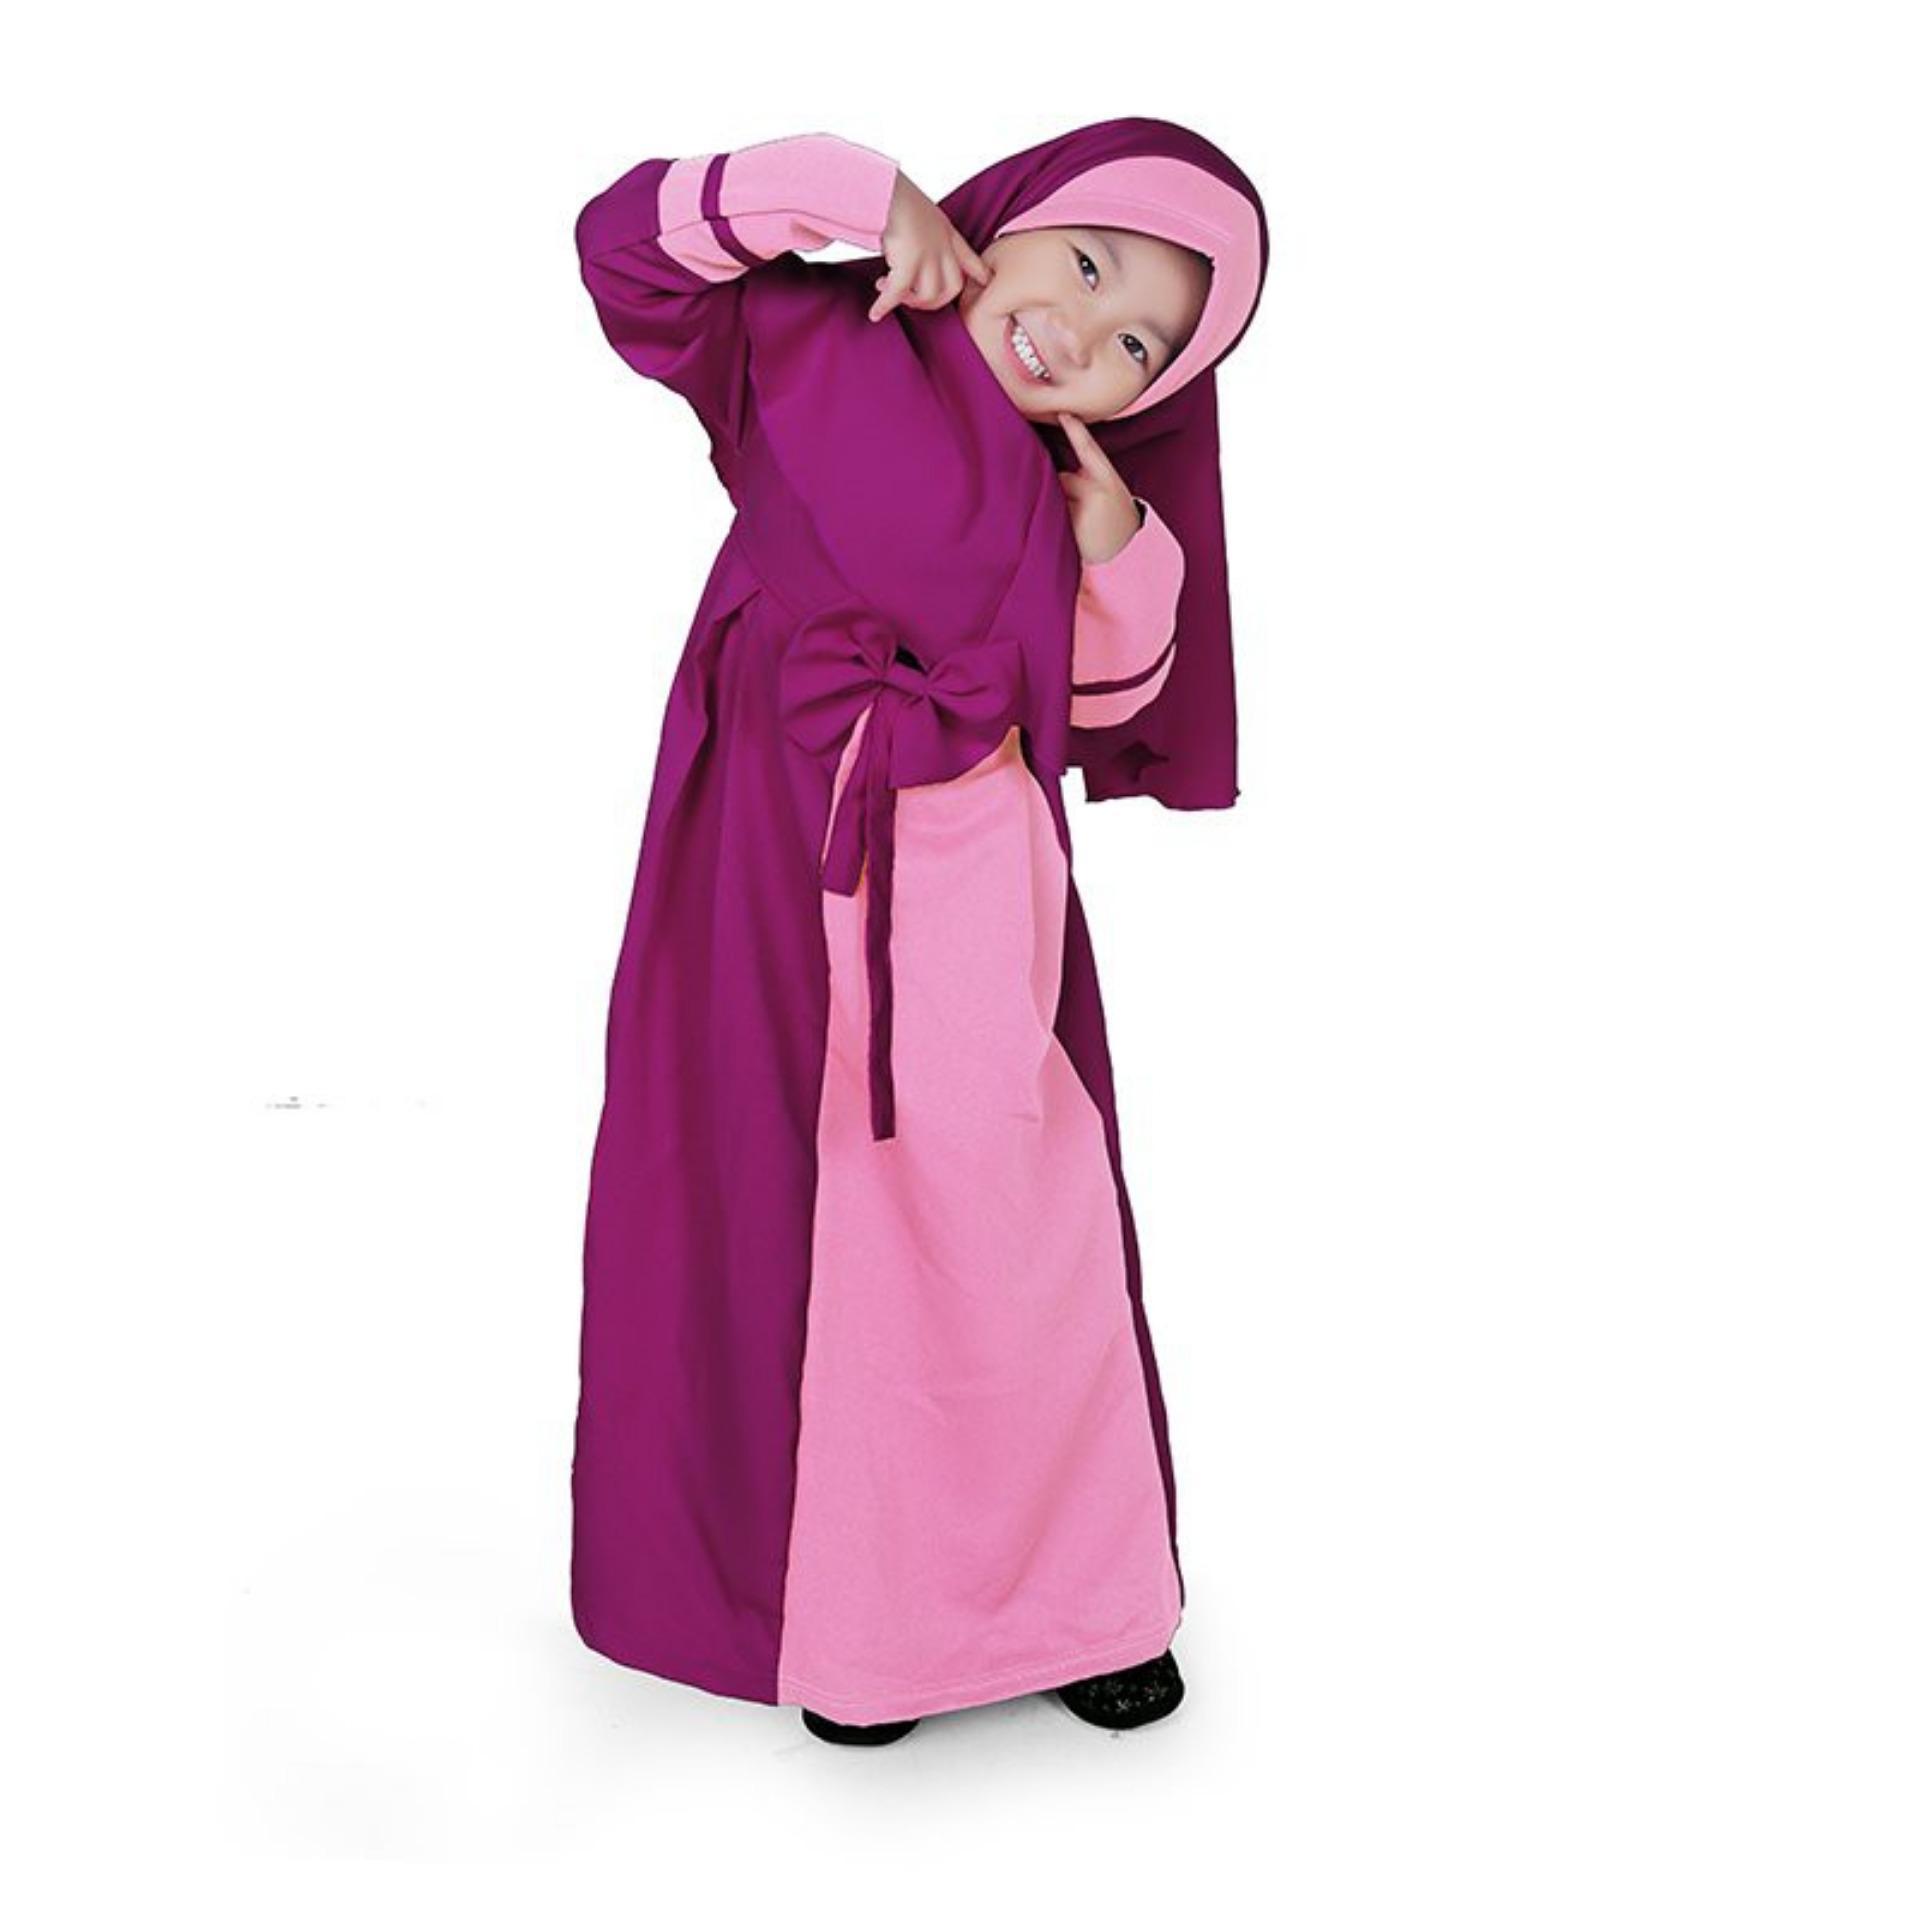 Gamis Anak Perempuan Balotelli Pita Murah - Ungu / gamis anak / baju muslim / baju muslim murah / gamis anak perempuan